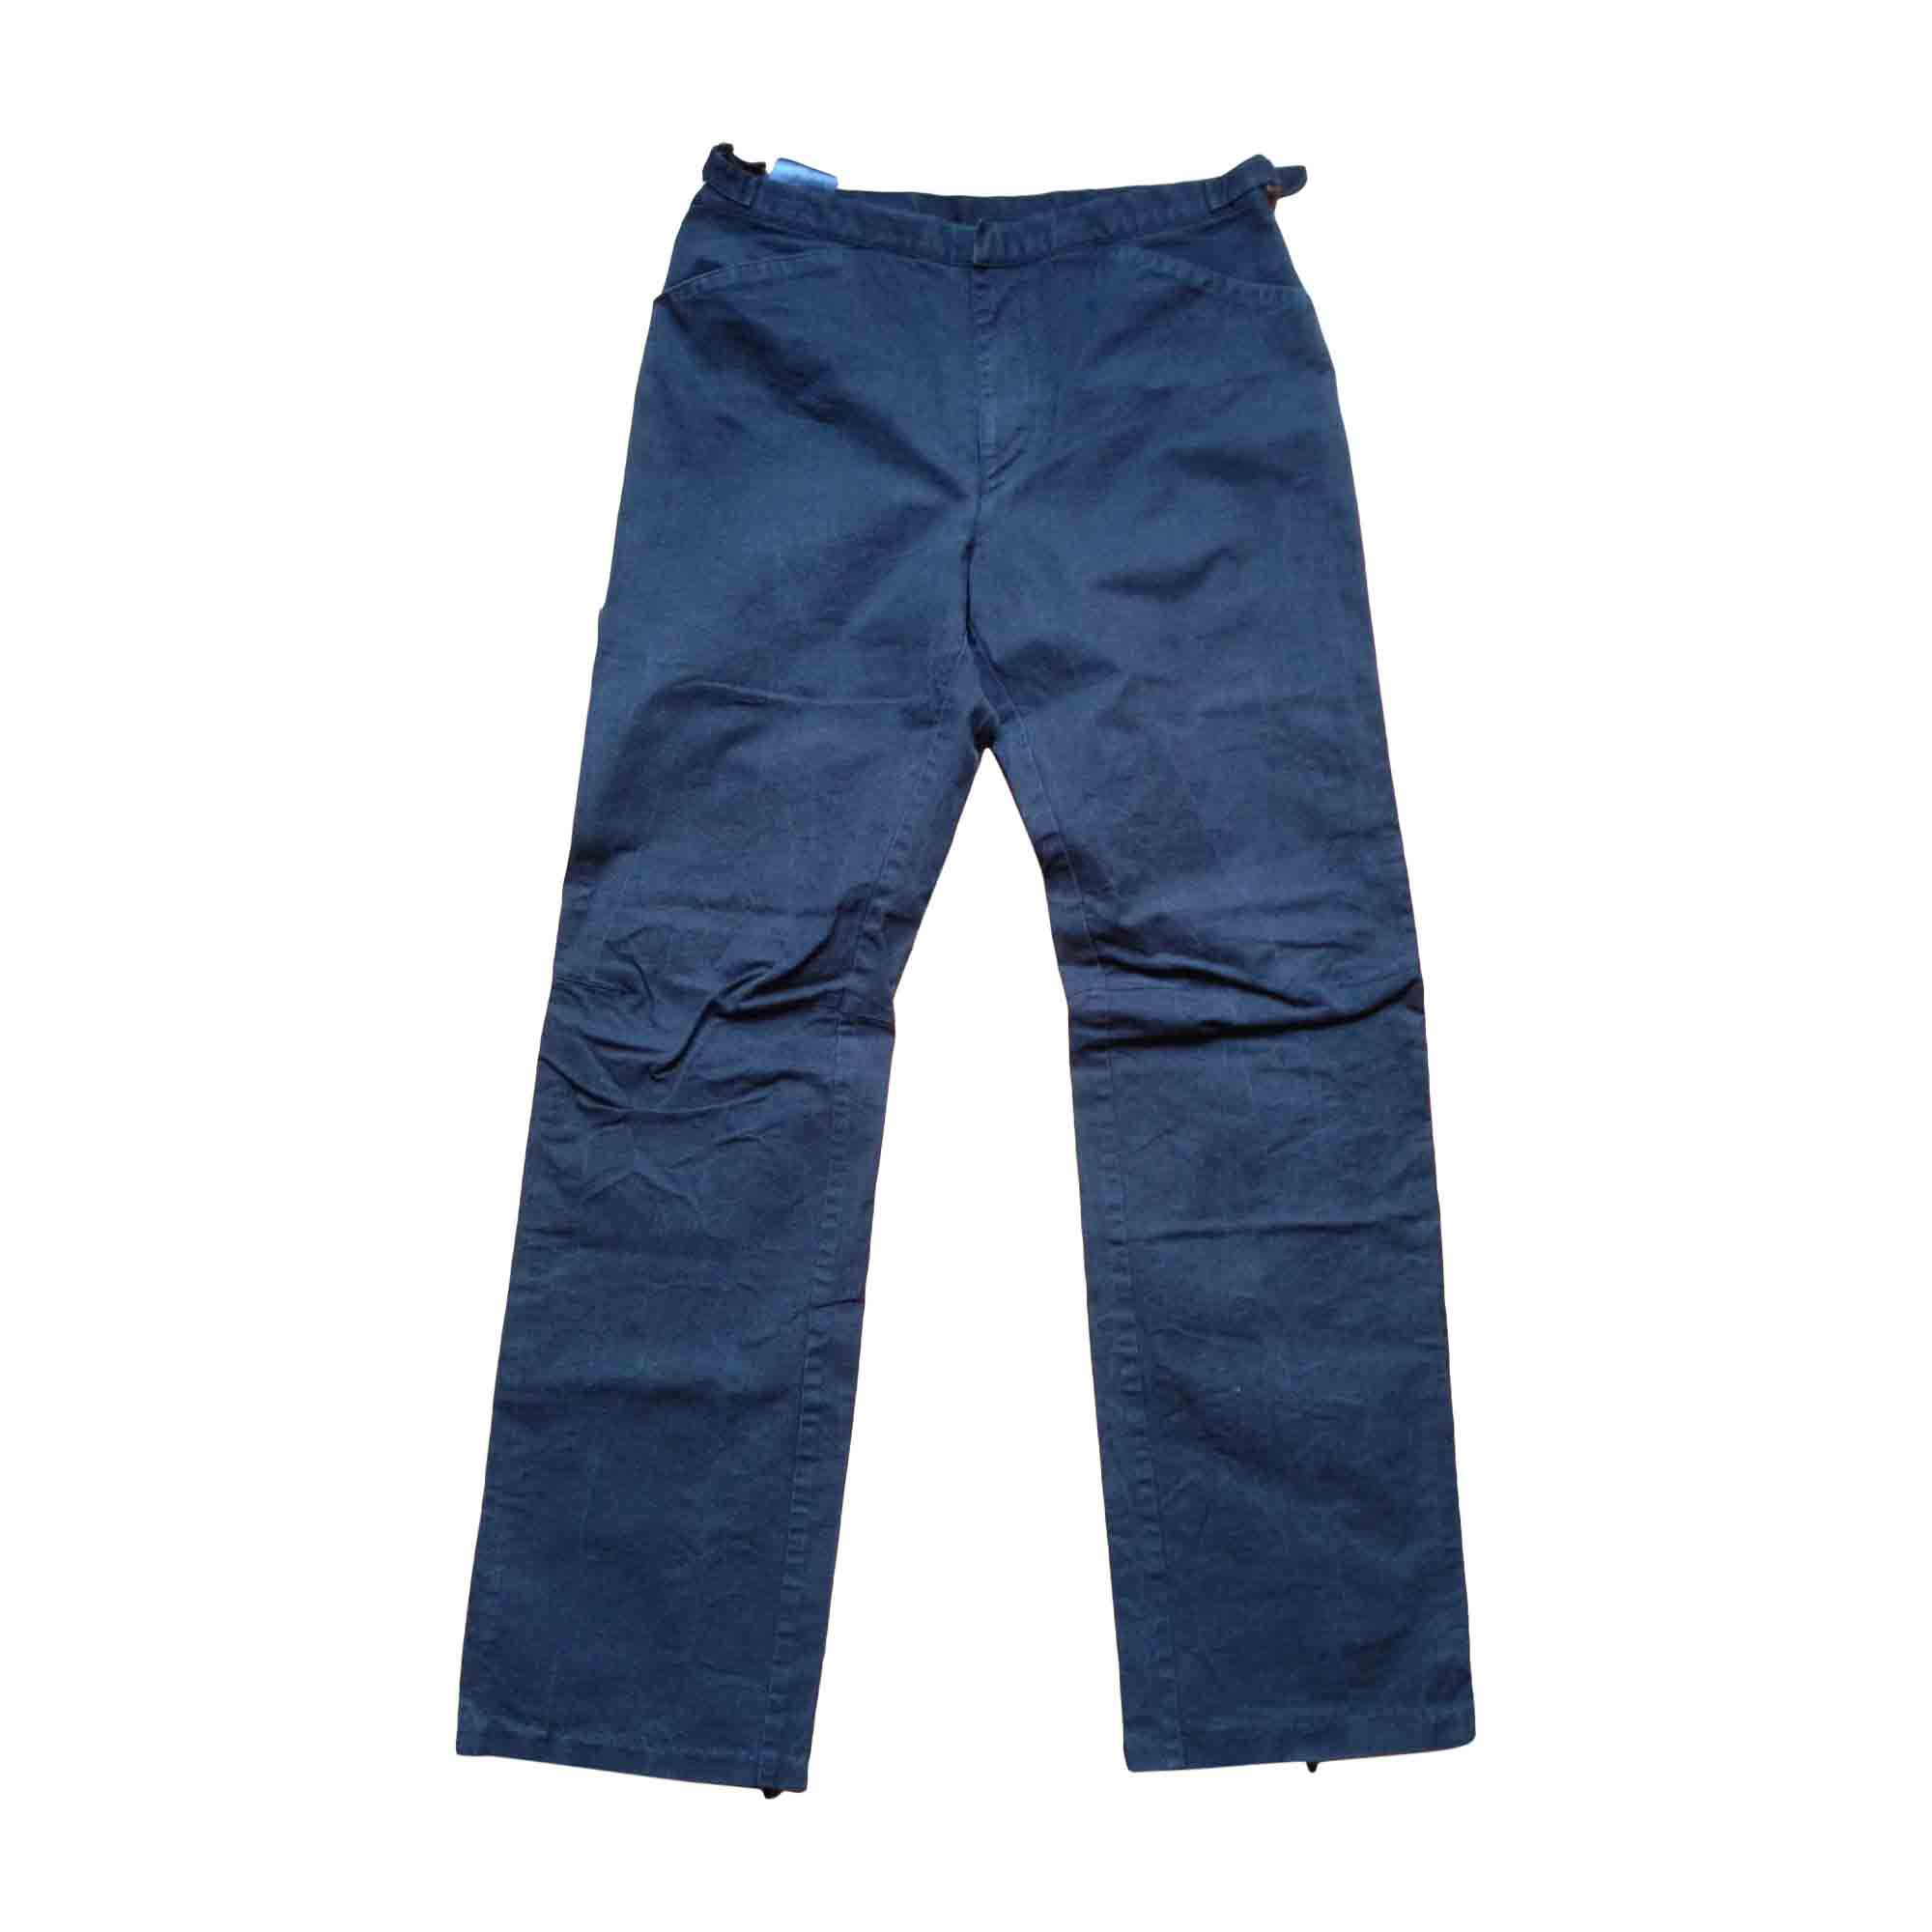 Pantalon droit BURBERRY Bleu, bleu marine, bleu turquoise